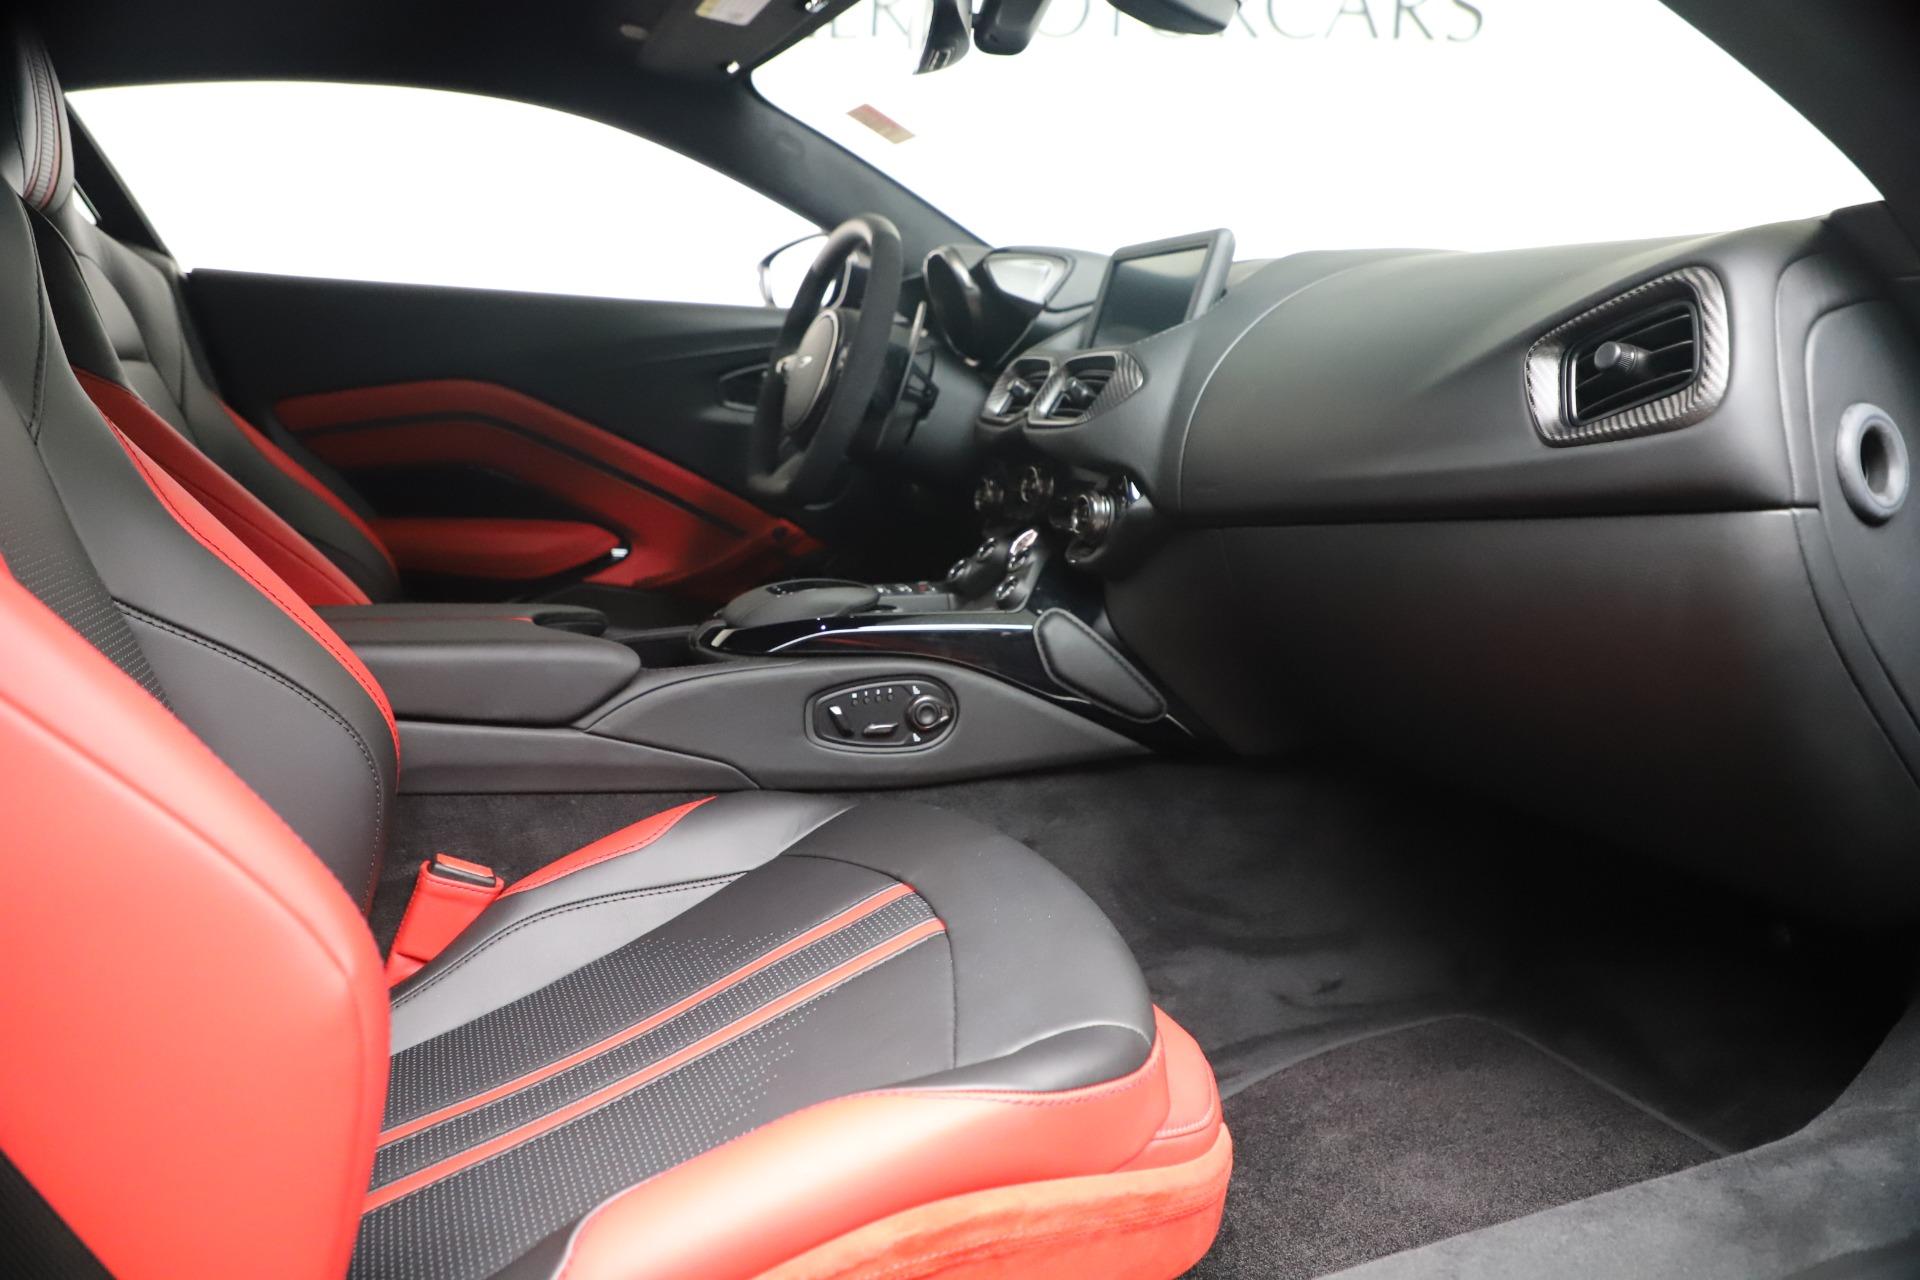 New 2020 Aston Martin Vantage V8 For Sale In Greenwich, CT 3547_p18